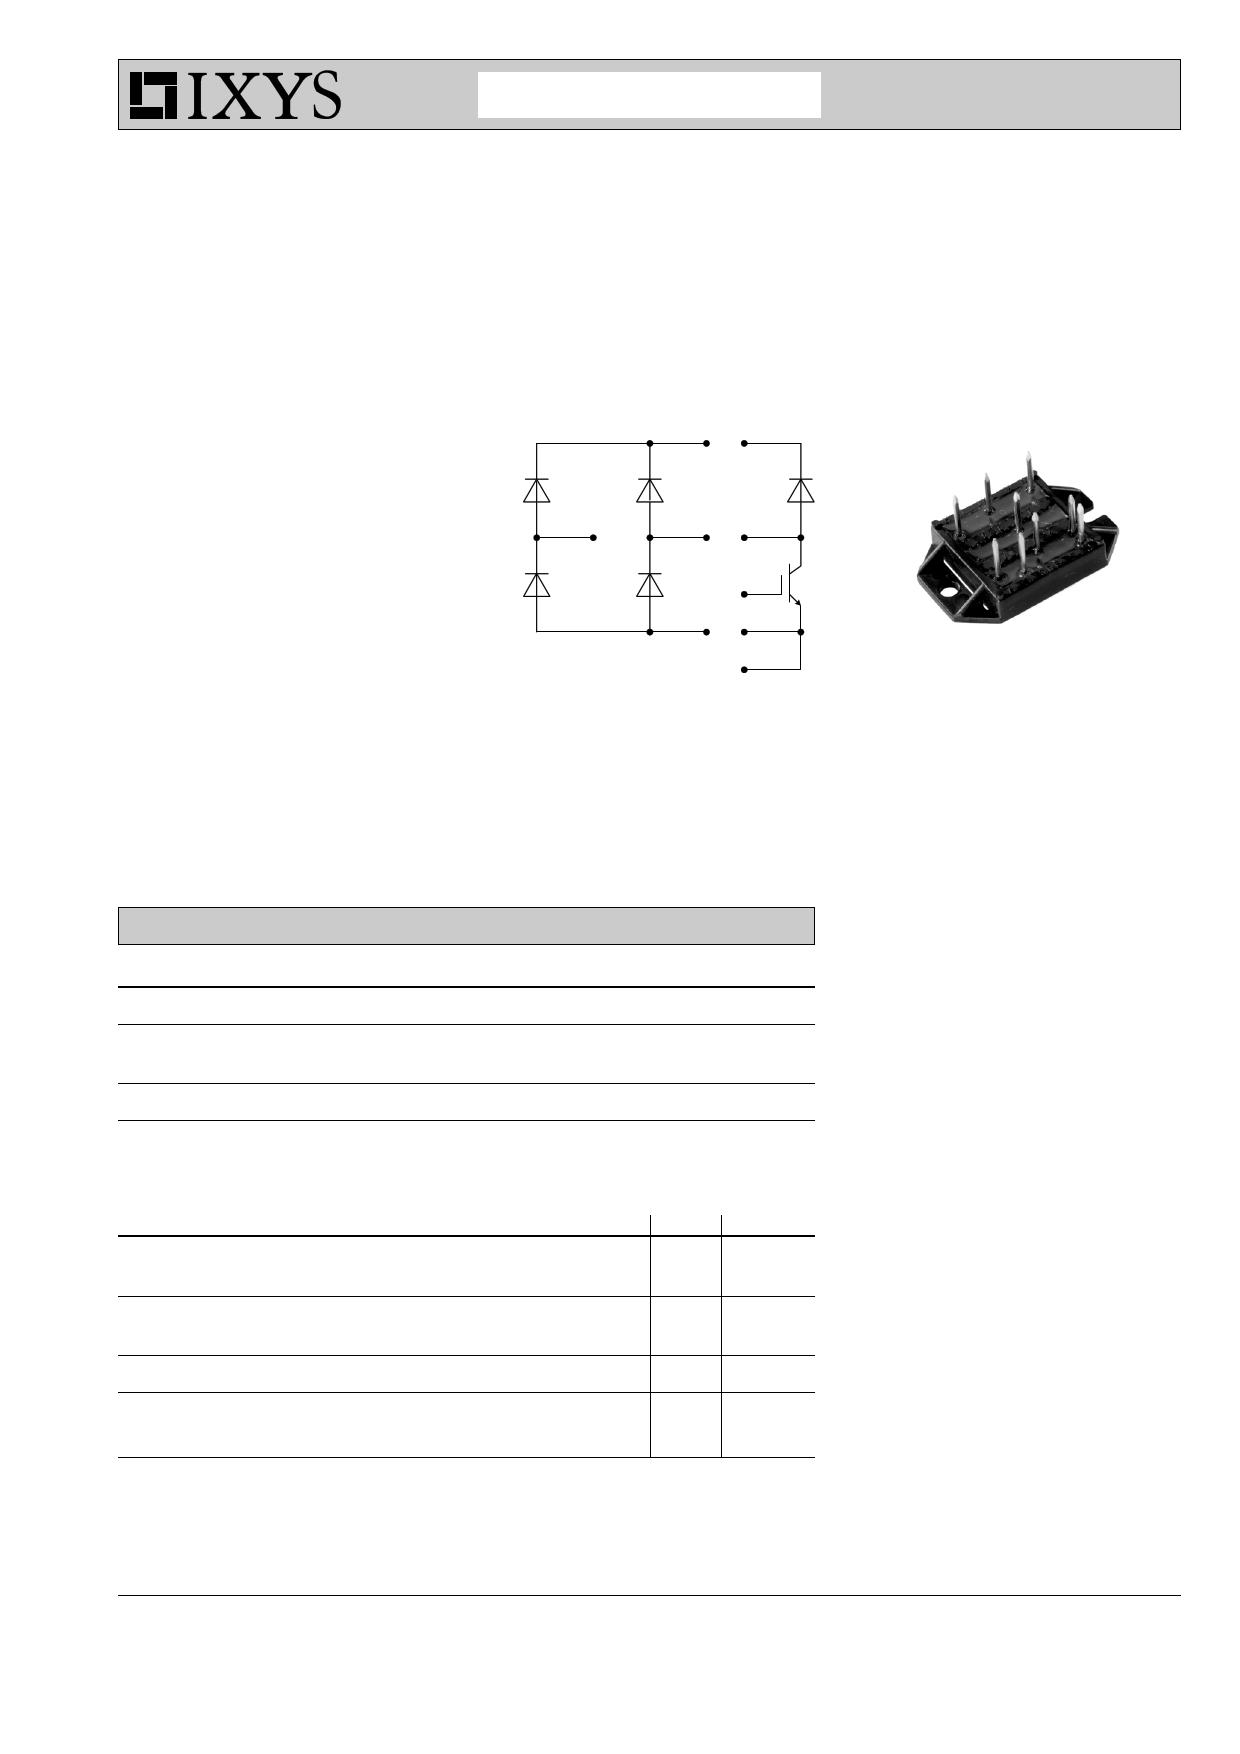 VUI9-06N7 datasheet